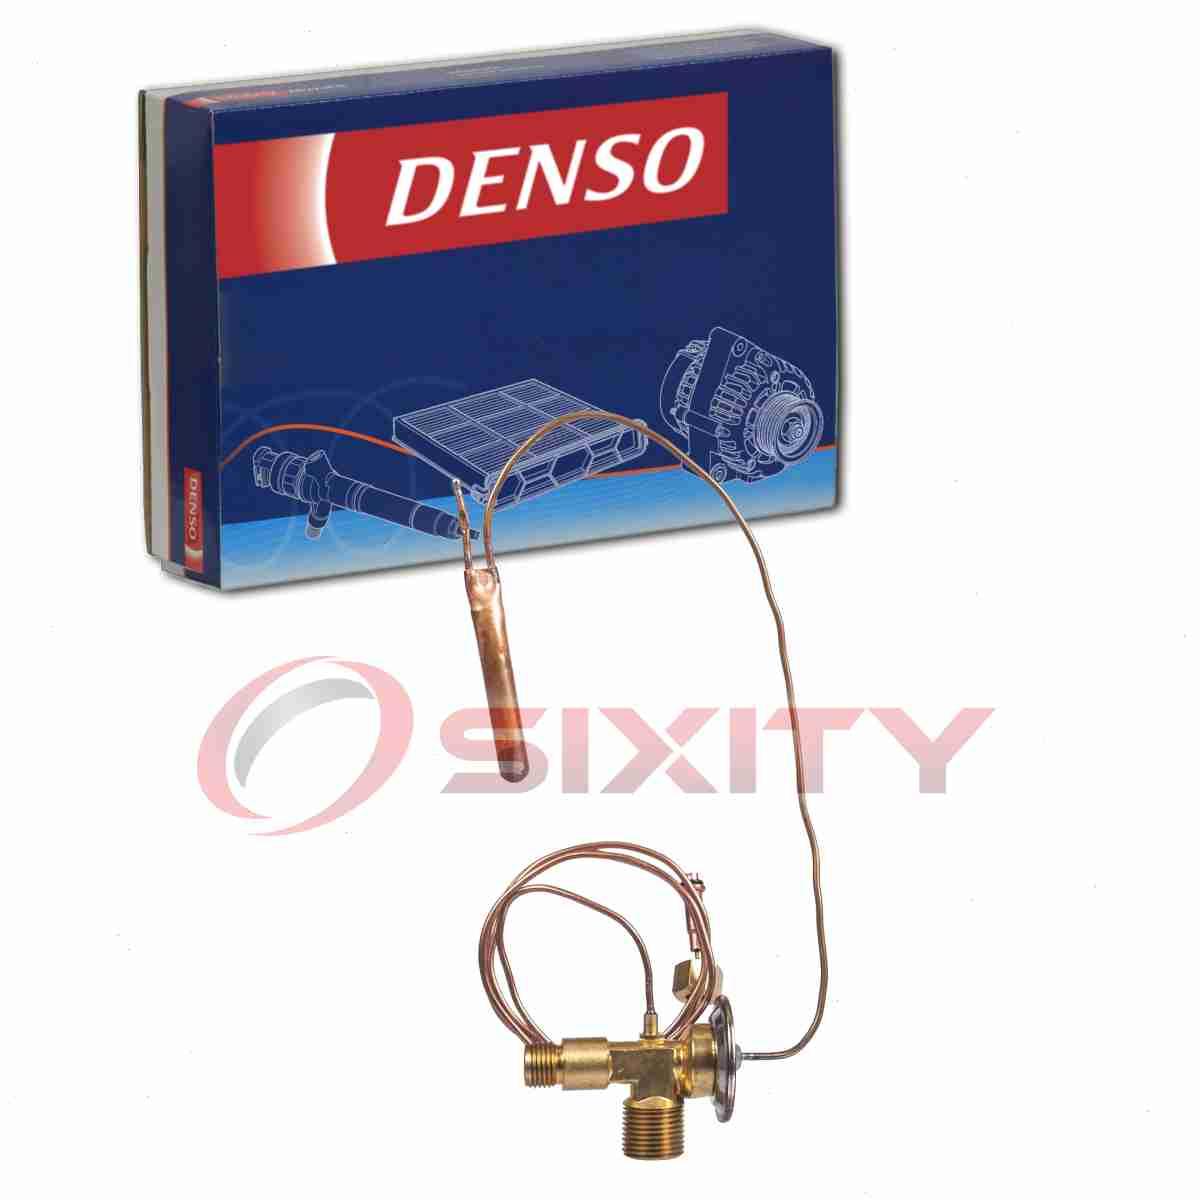 Denso 475-7102 Expansion Valve